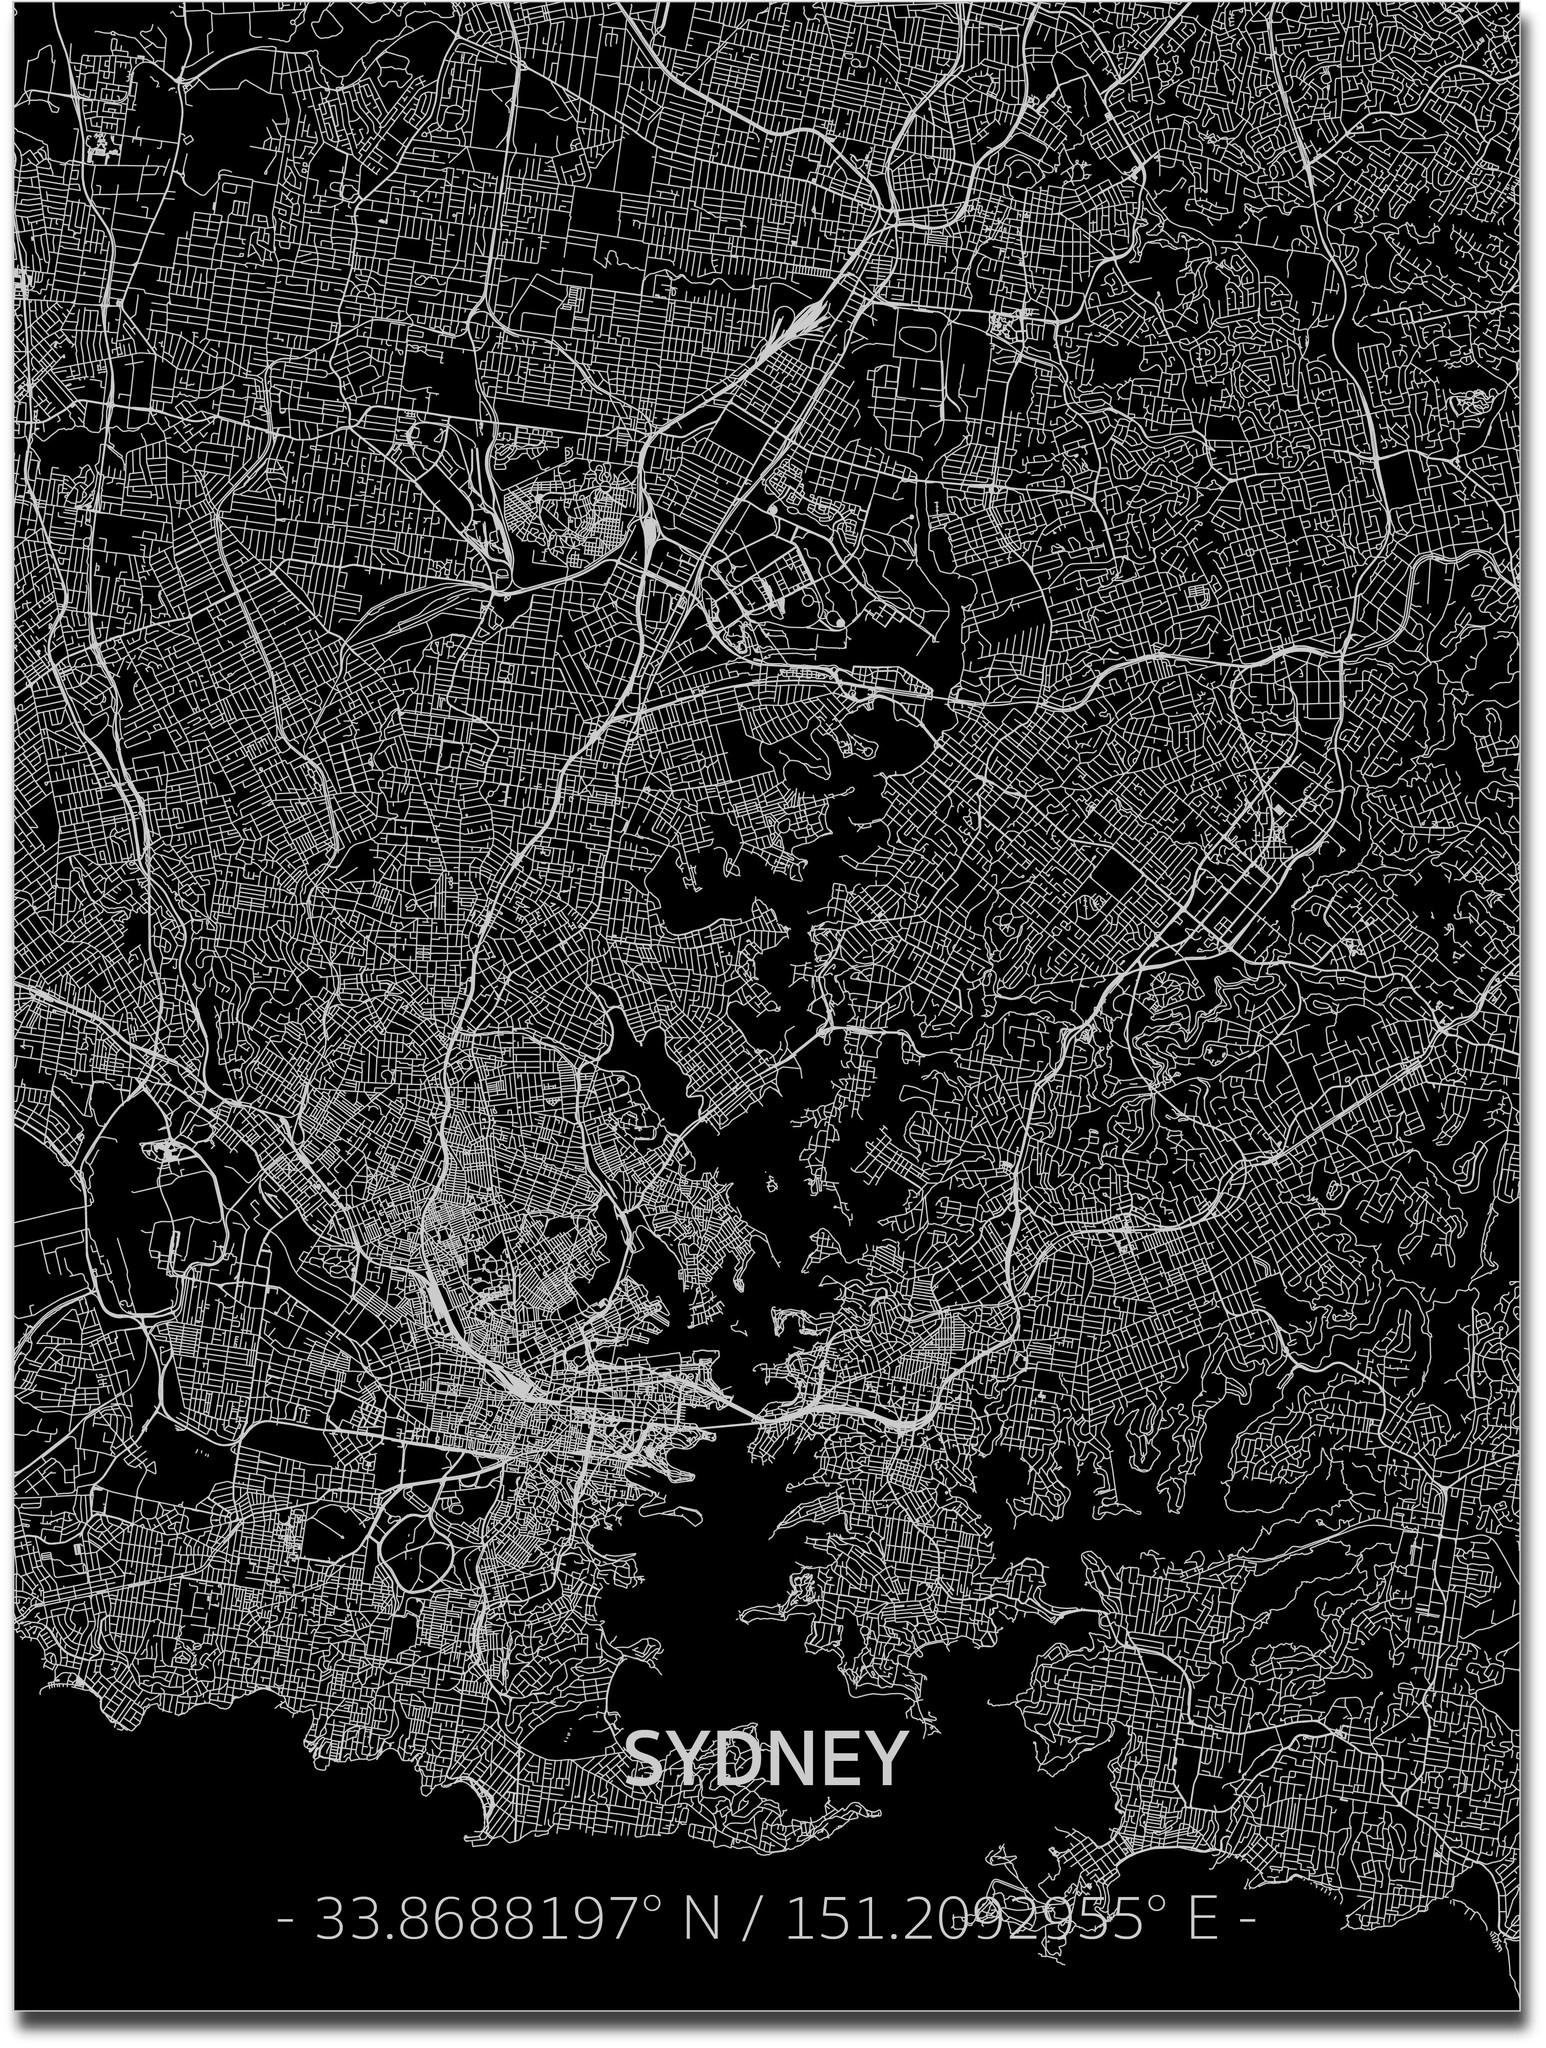 Citymap Sydney | Aluminum wall decoration-1